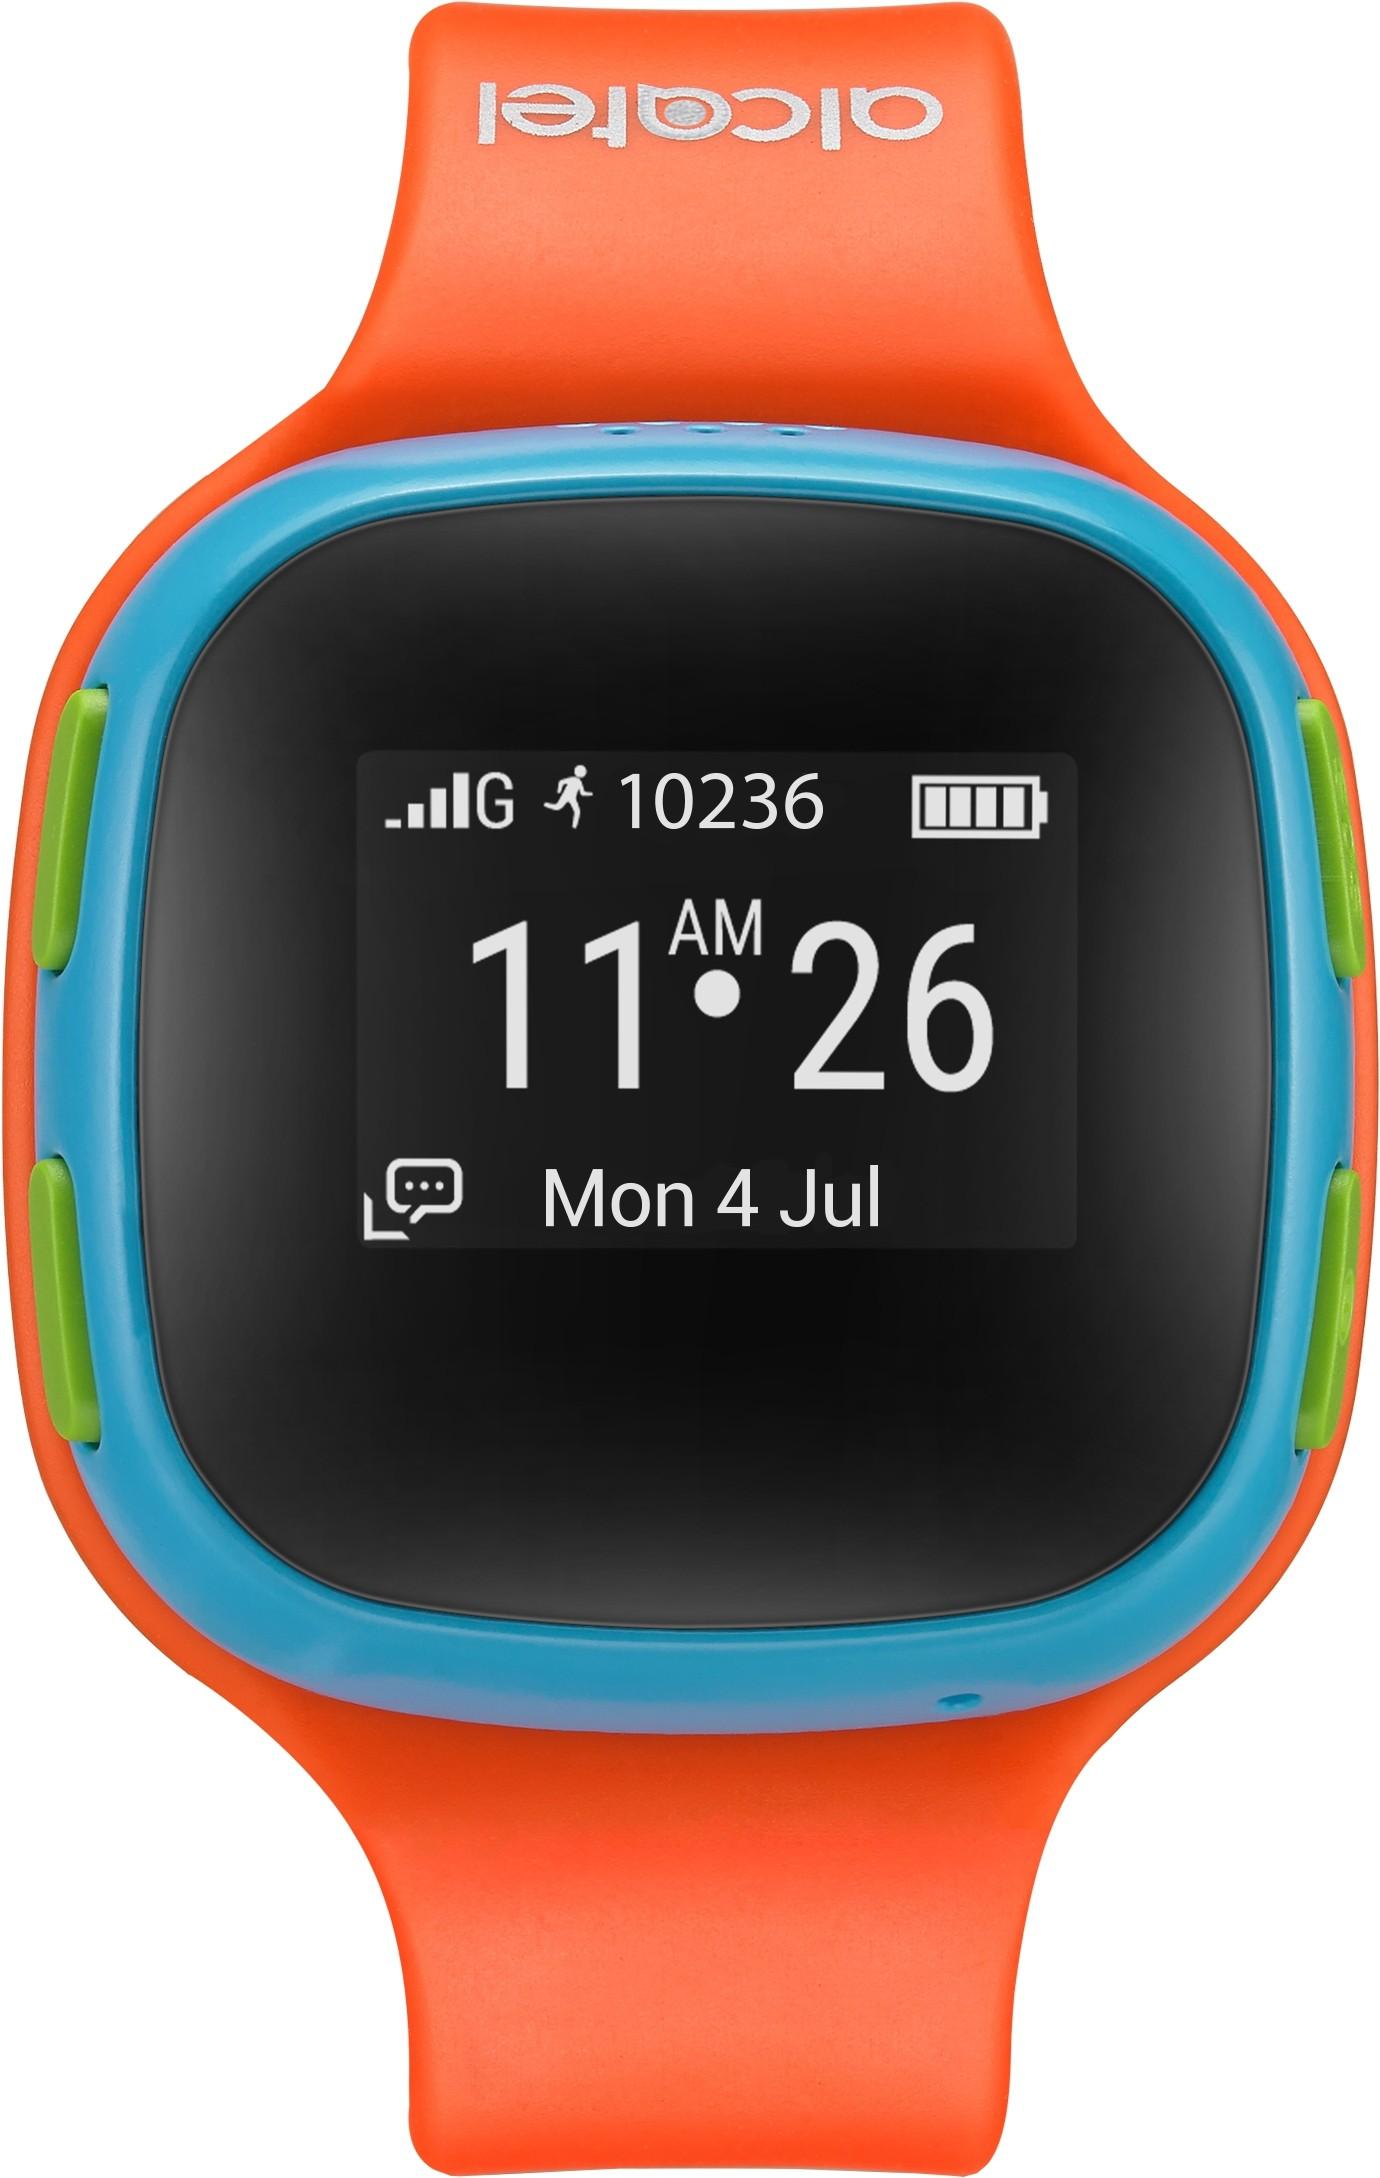 Deals | Alcatel Kids Watch Flat ₹500 Off